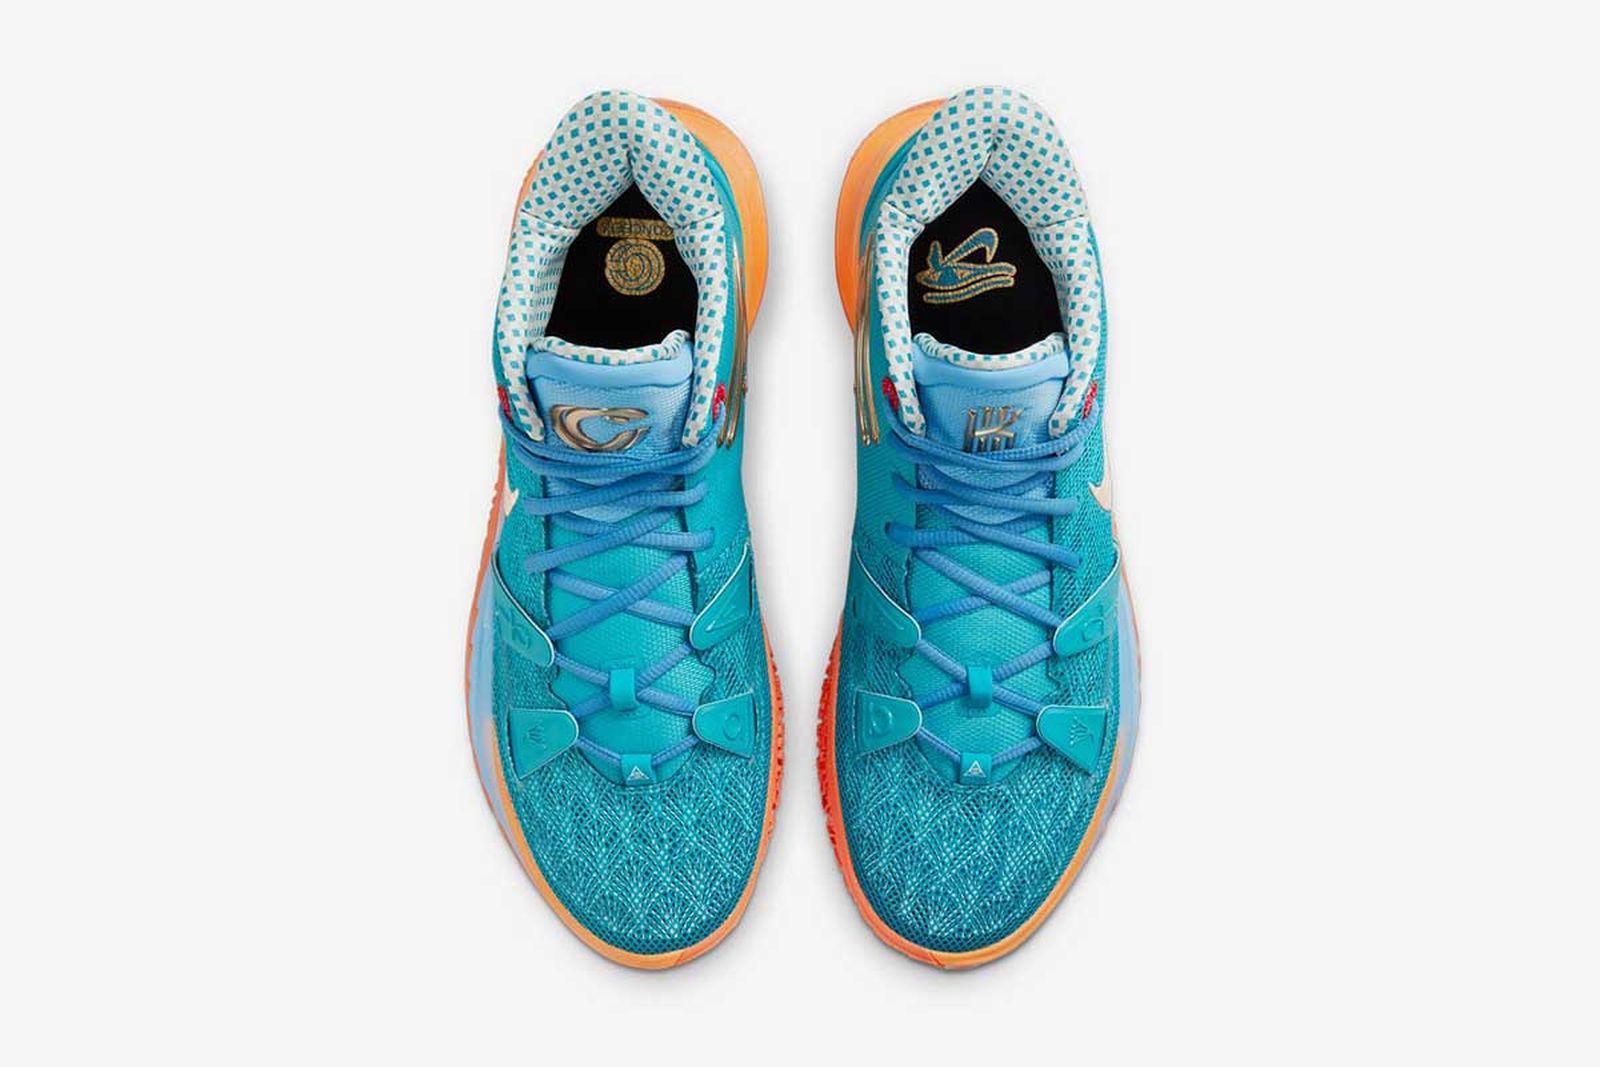 sneaker-news-02-25-2021-1-04